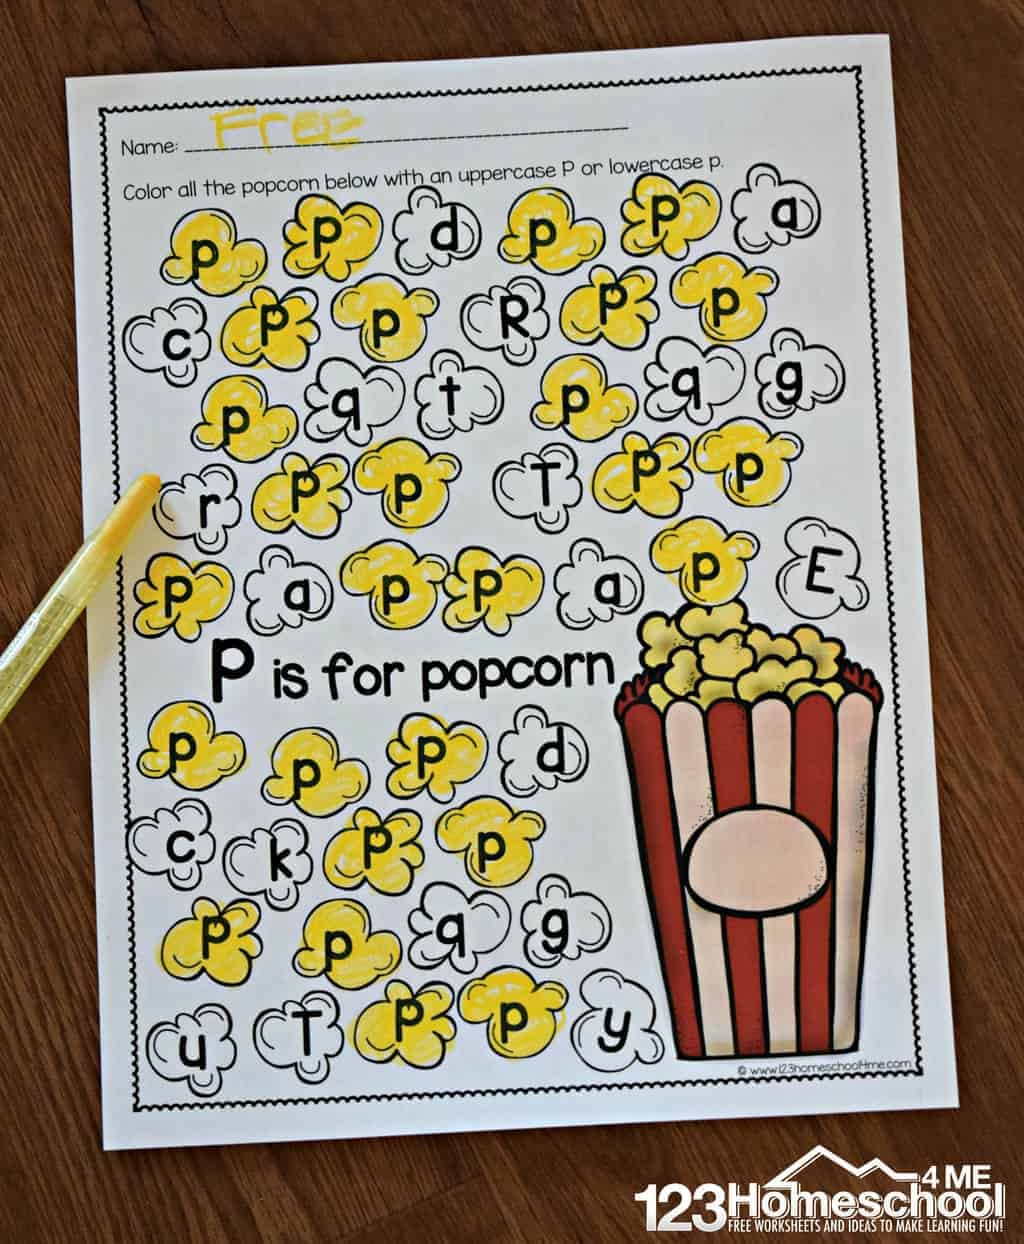 Free A To Z Letter Find Worksheets for Alphabet Worksheets A-Z Free